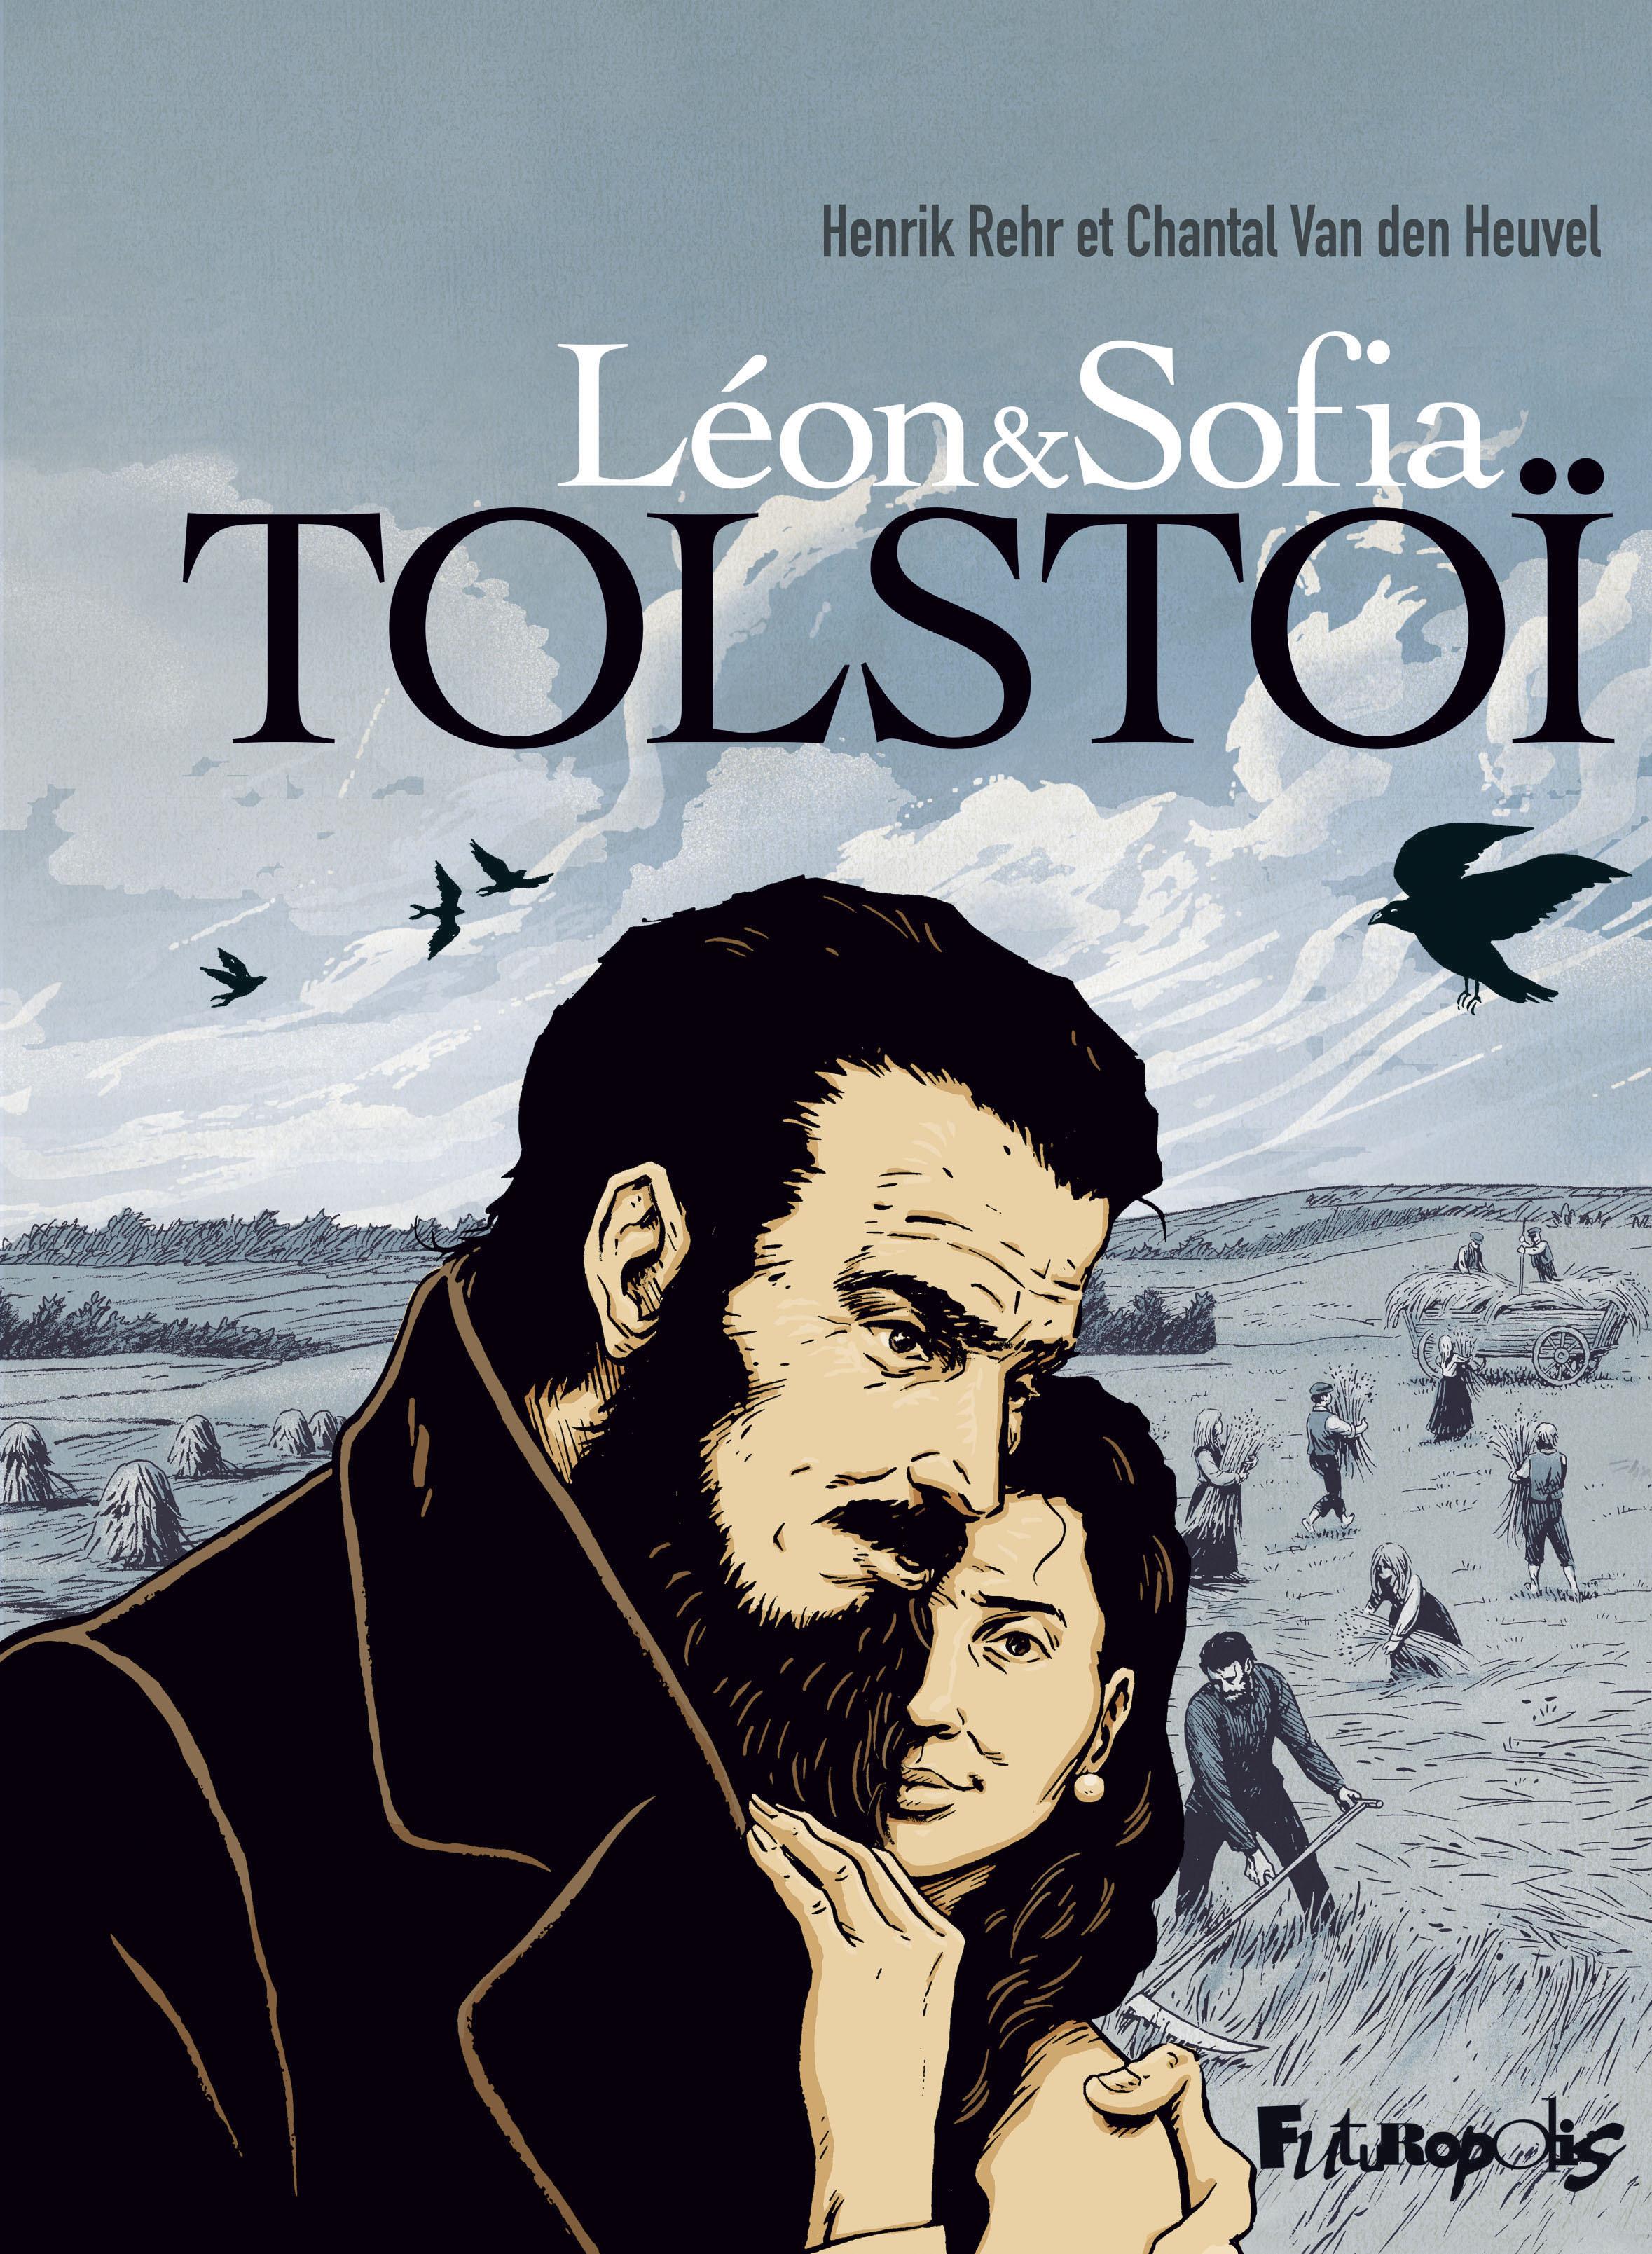 LEON & SOFIA TOLSTOI